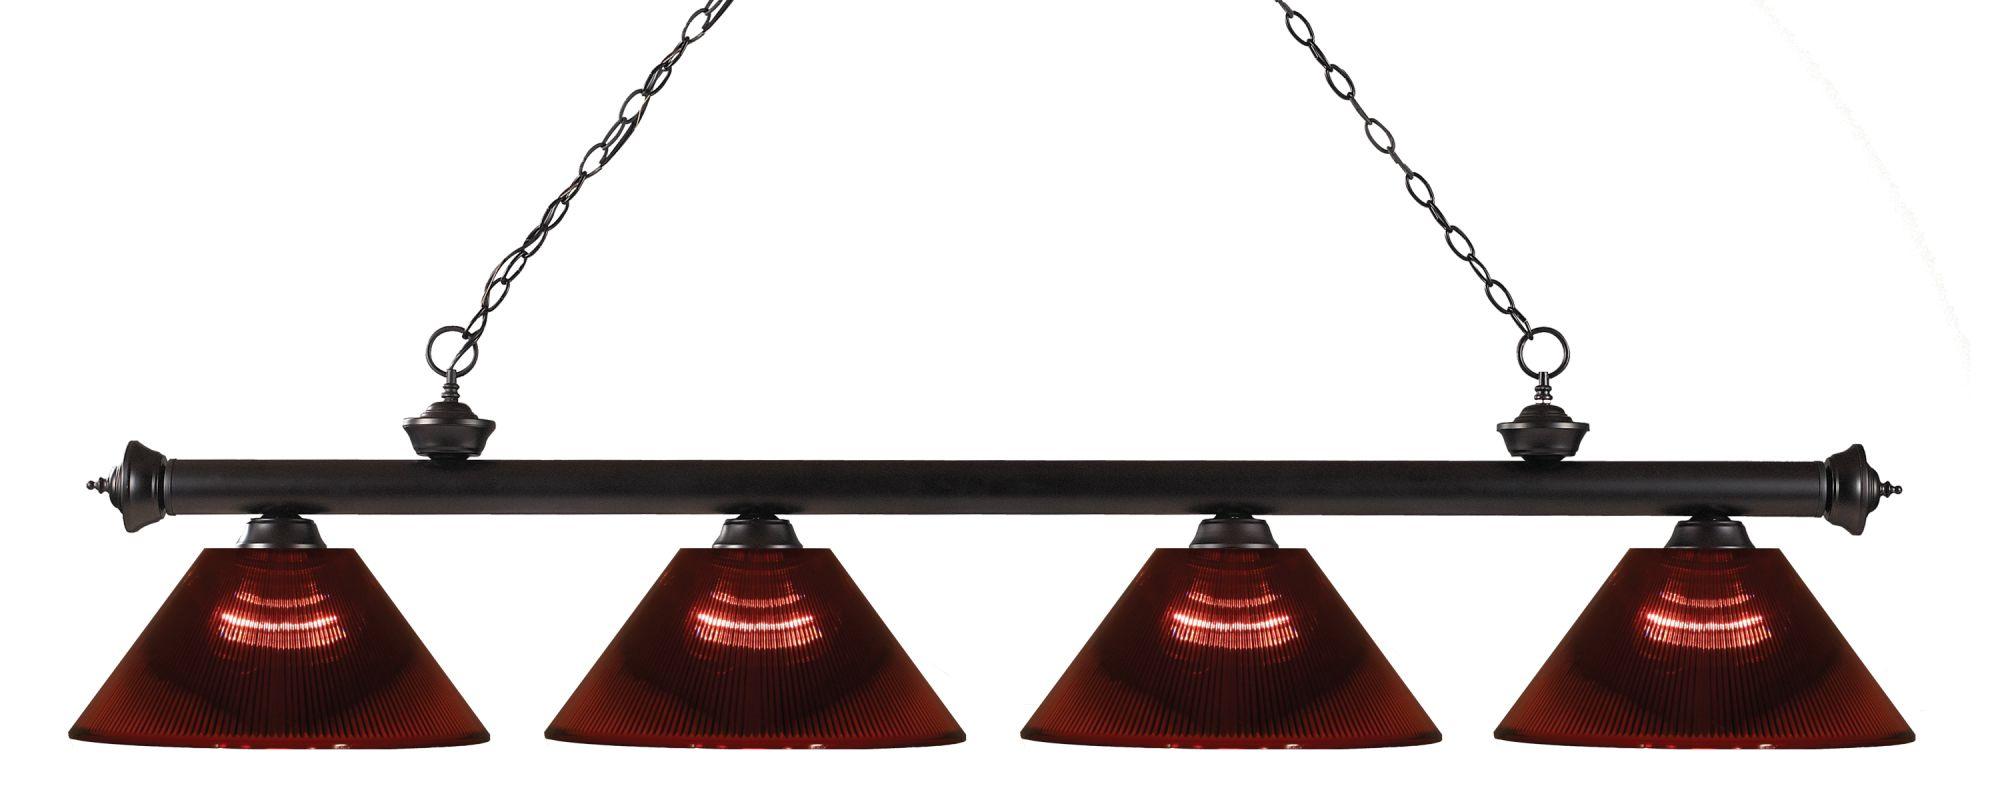 Z-Lite 200-4-ARBG Riviera 4 Light Island/Billiard Light with Burgundy Sale $356.00 ITEM: bci2564637 ID#:200-4BRZ-ARBG UPC: 685659041620 :